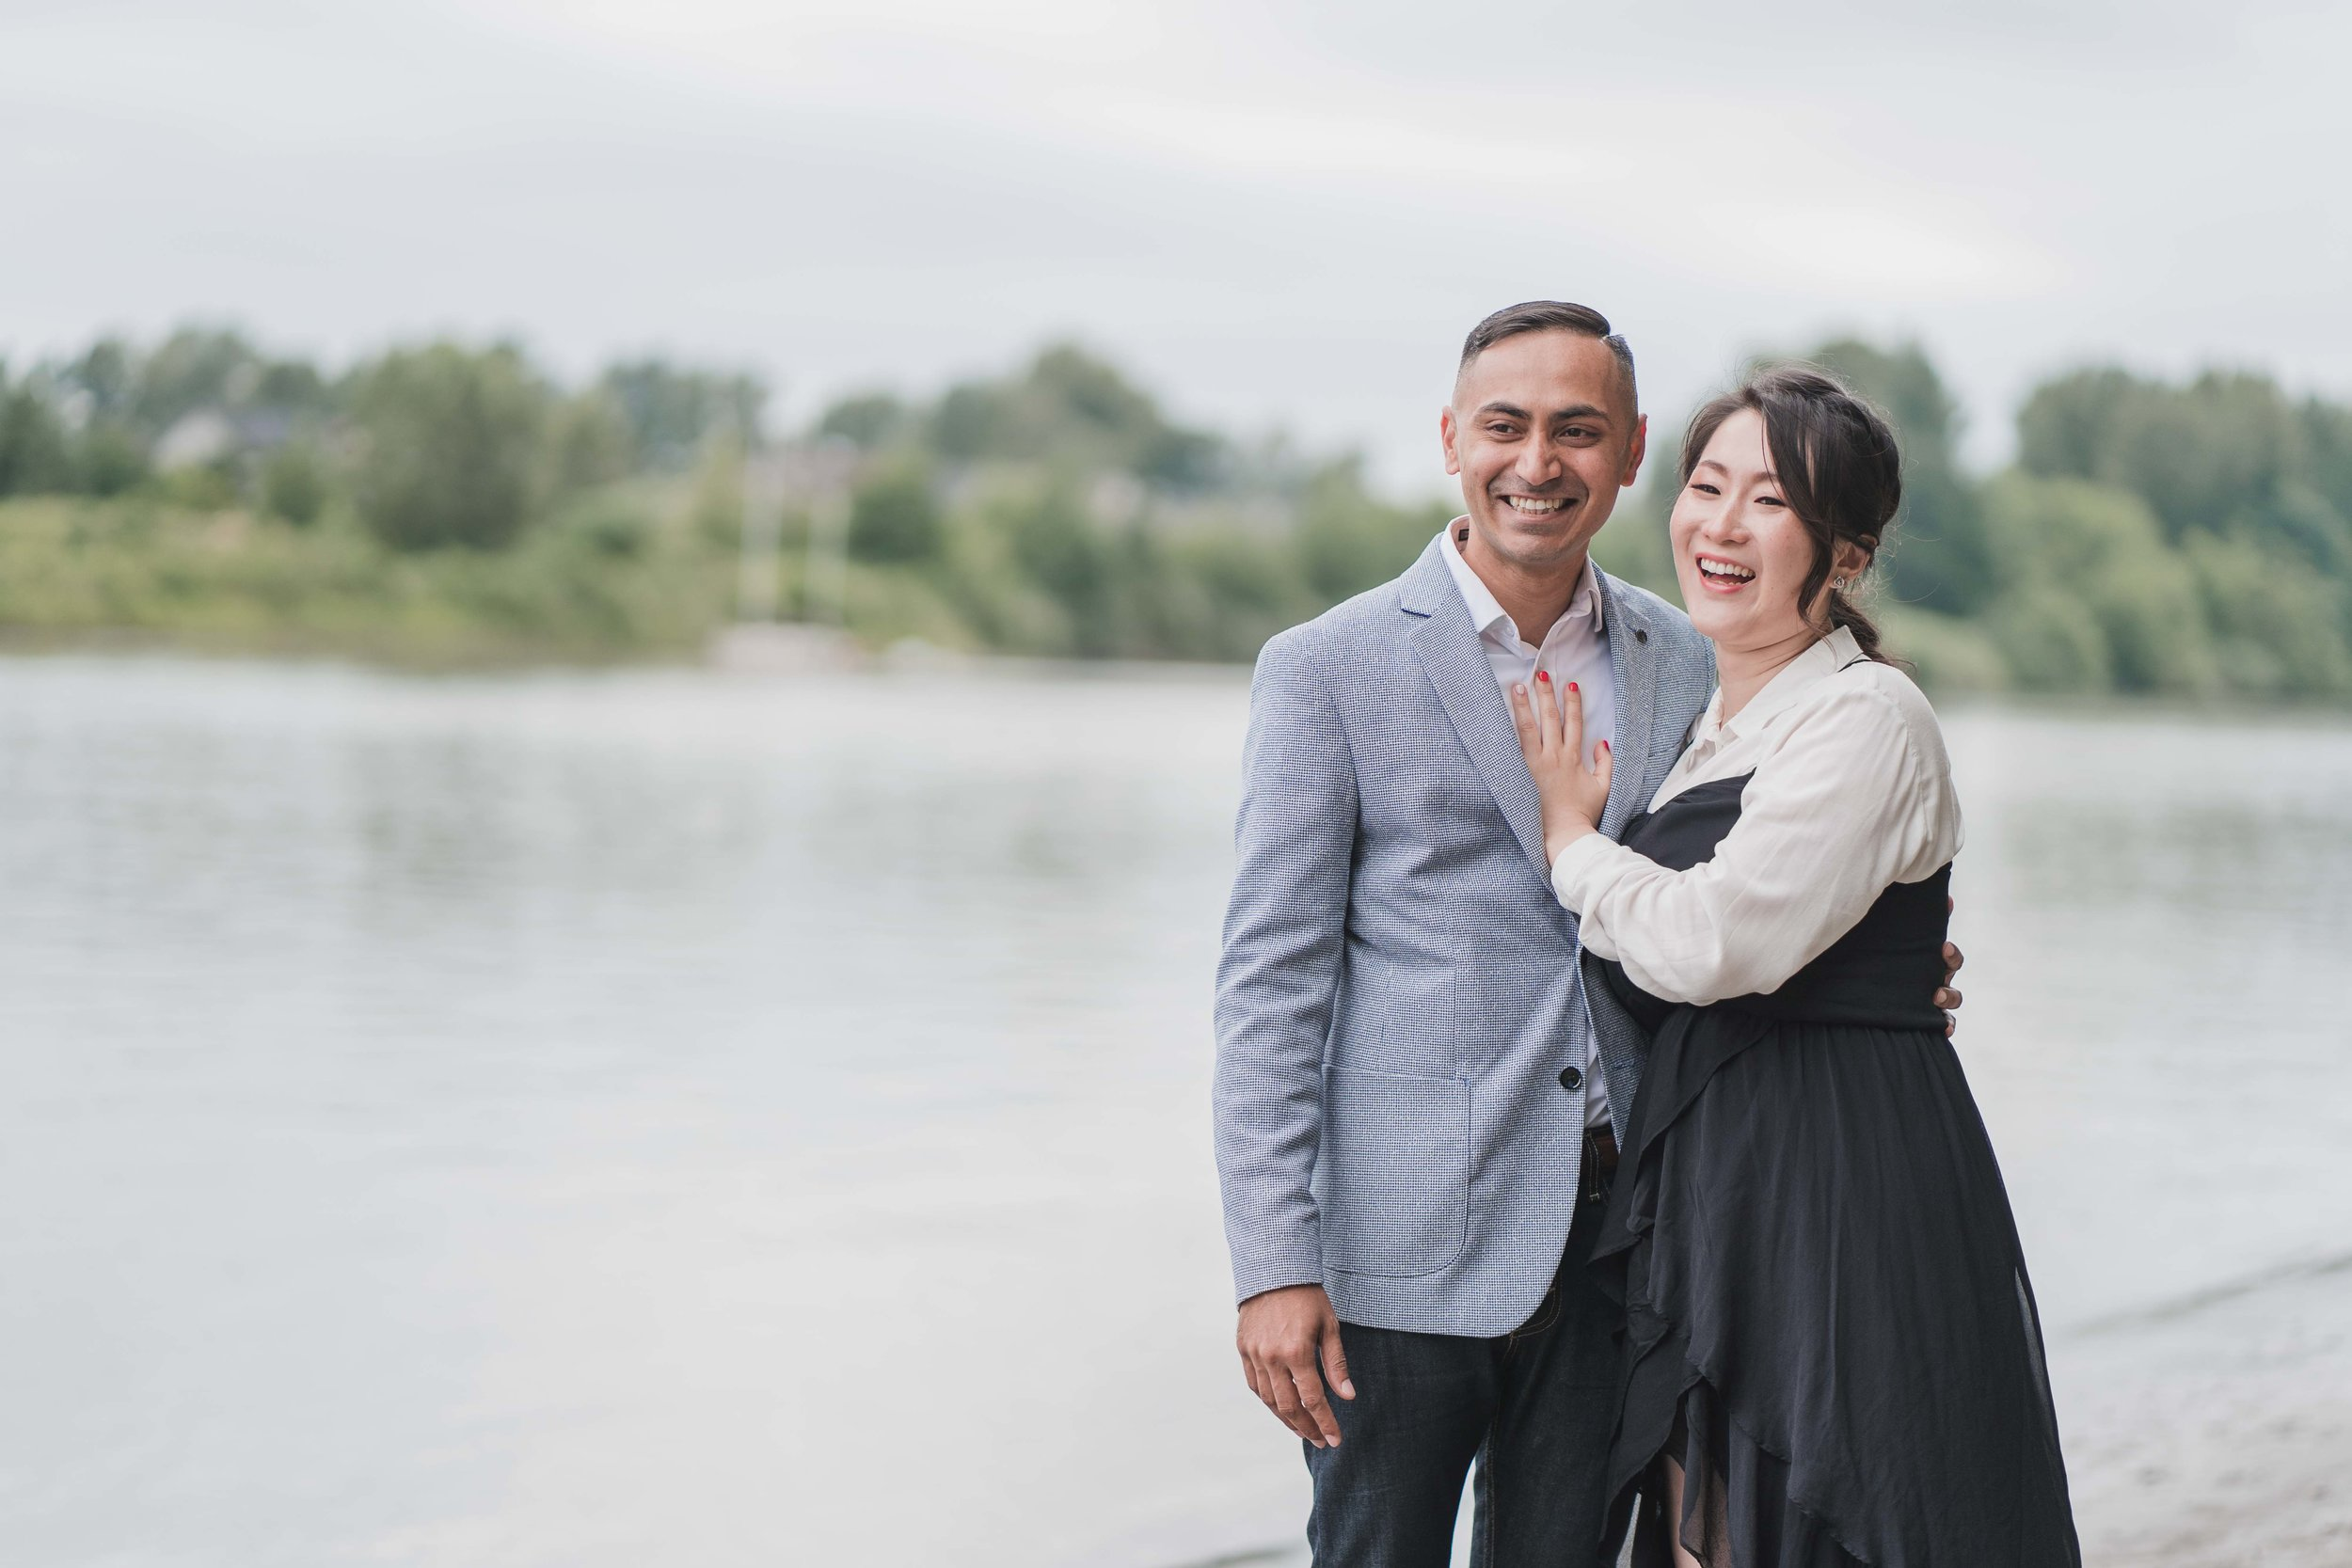 20190622 - Monika & Johnson Engagement - 0150.jpg